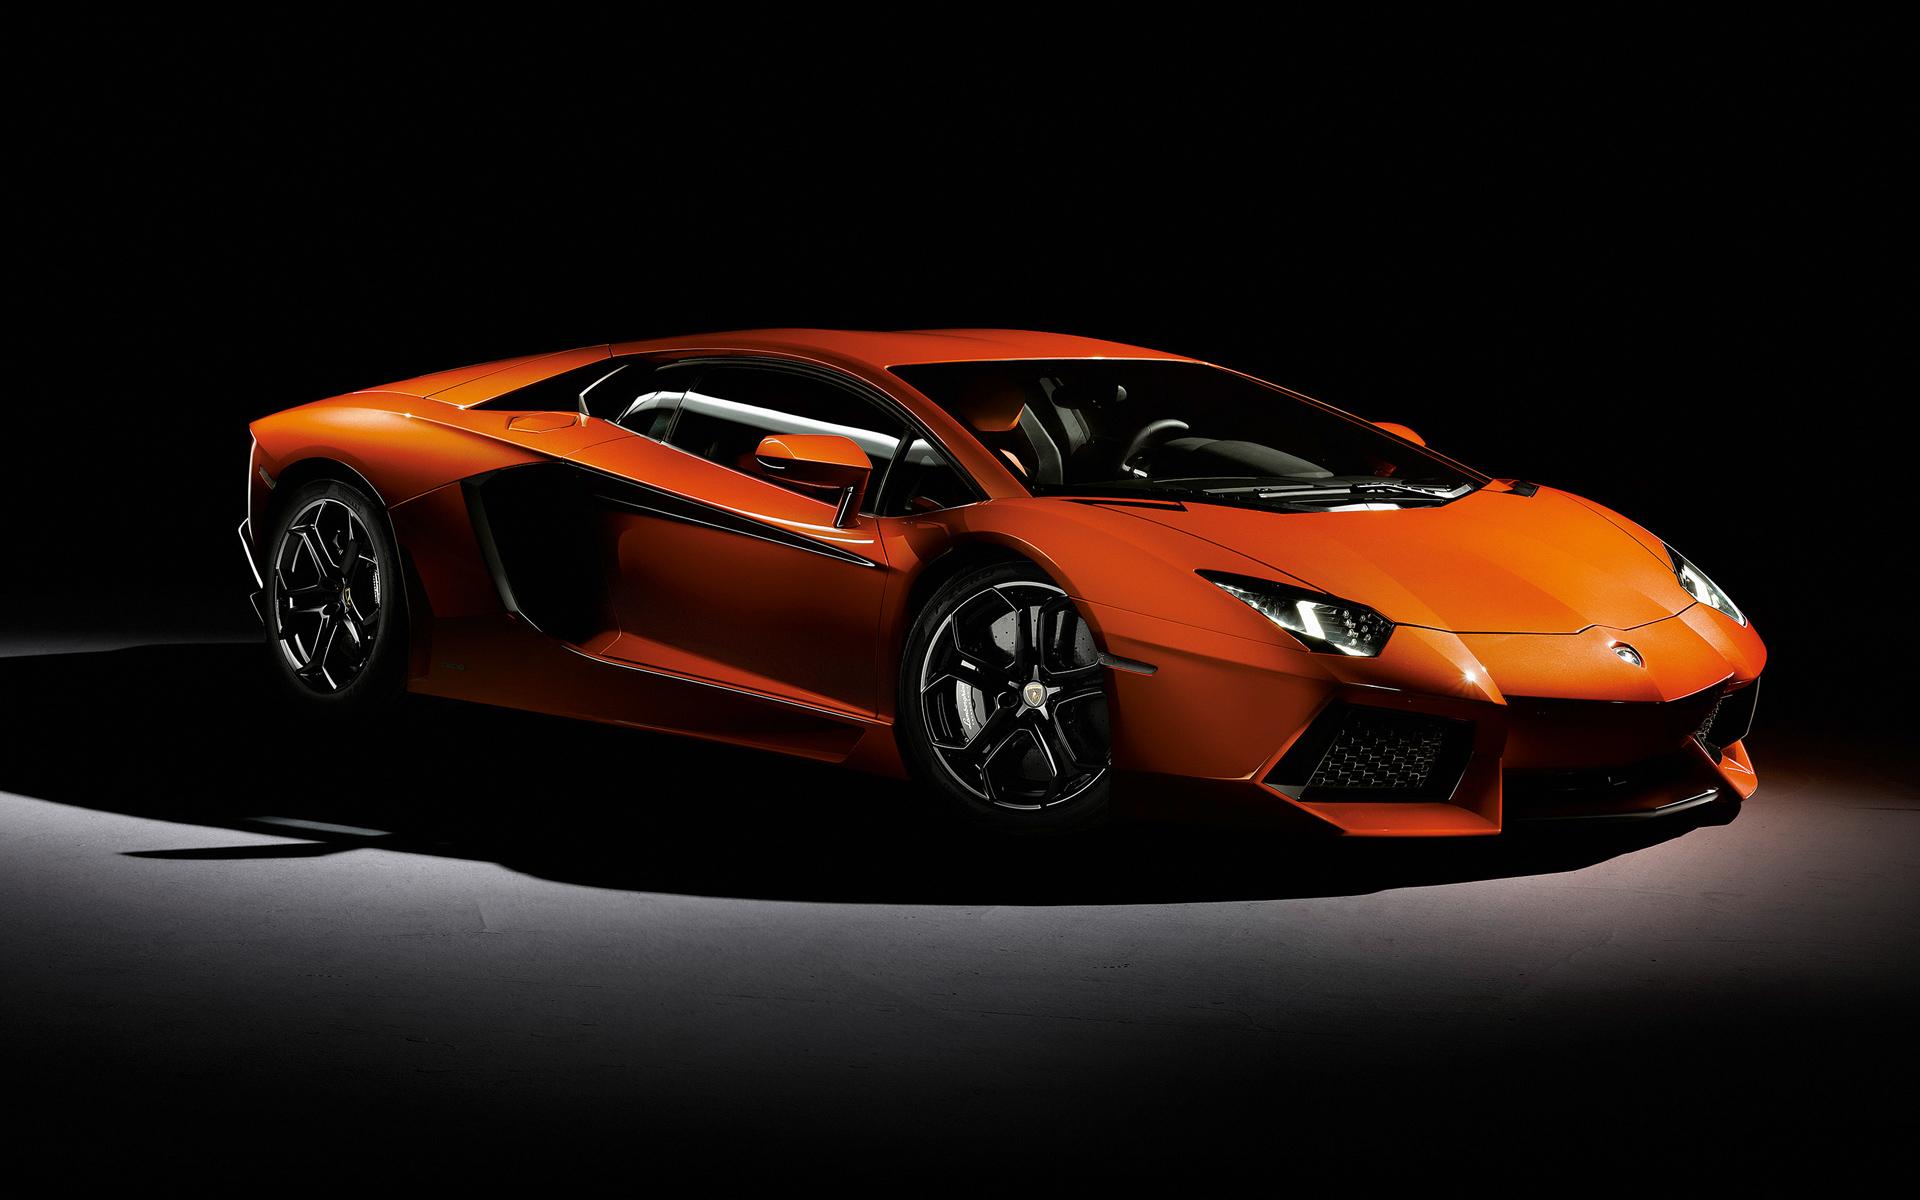 Best Lamborghini Car Wallpaper Image Wallpaper WallpaperLepi 1920x1200